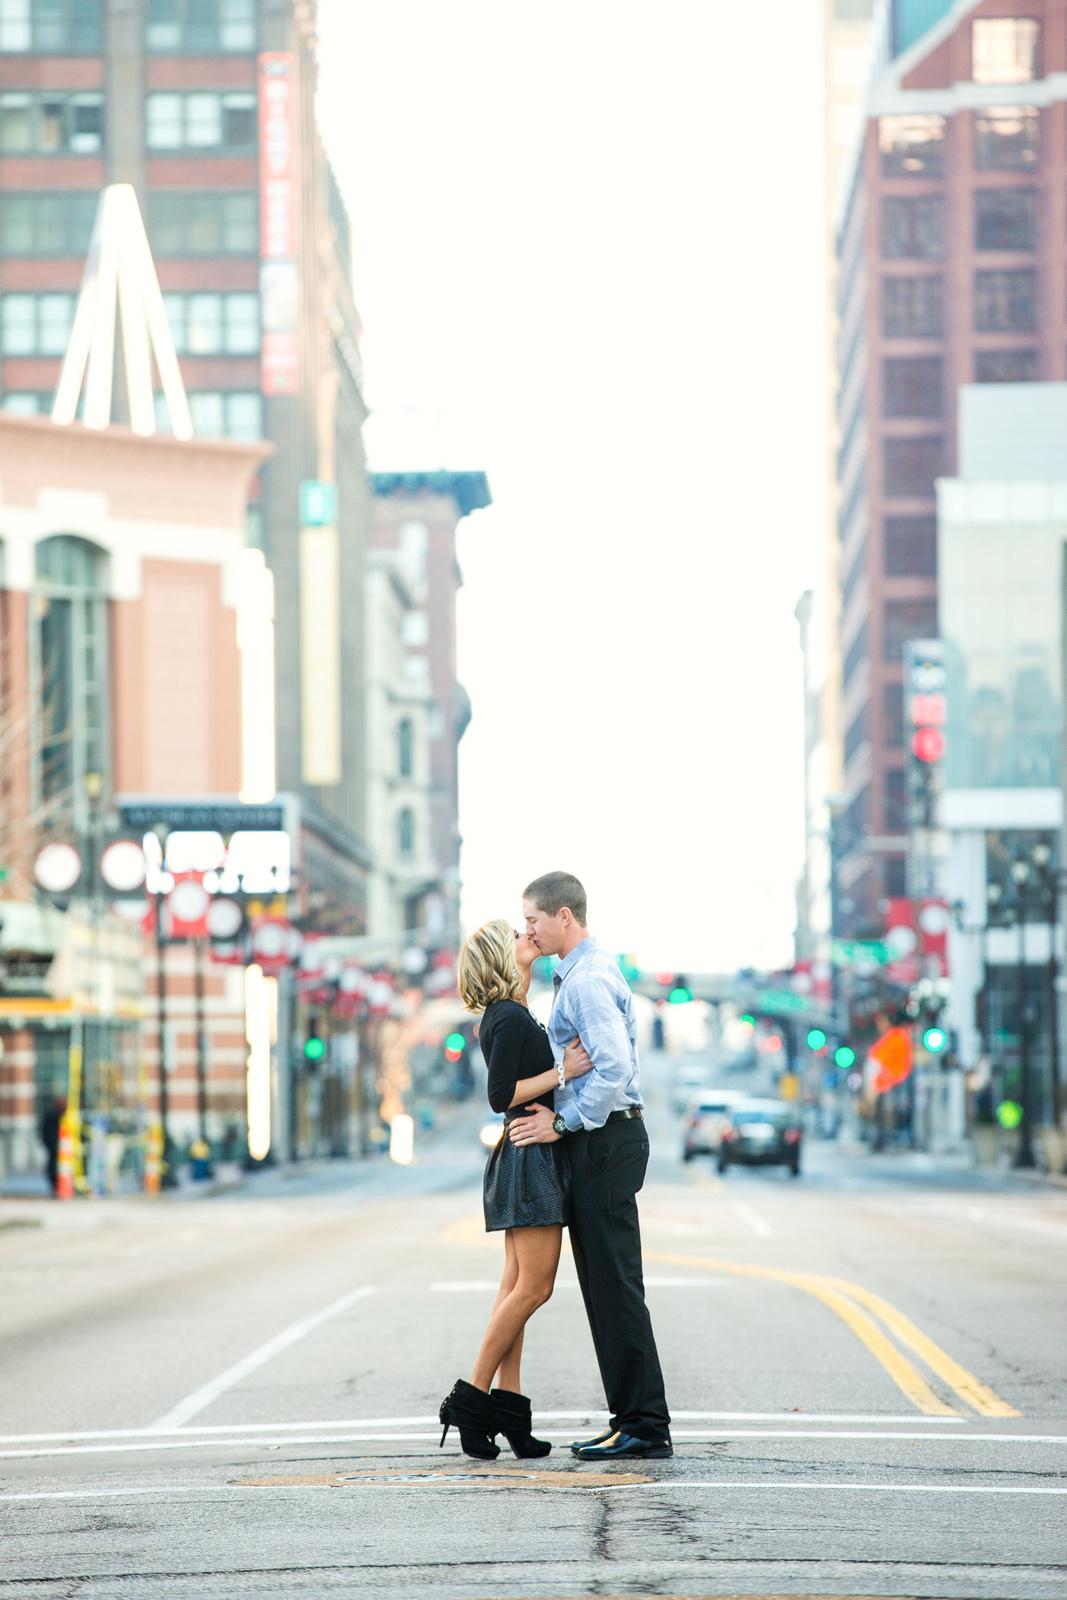 St Louis Downtown Engagement Photos_20141214_155240.jpg